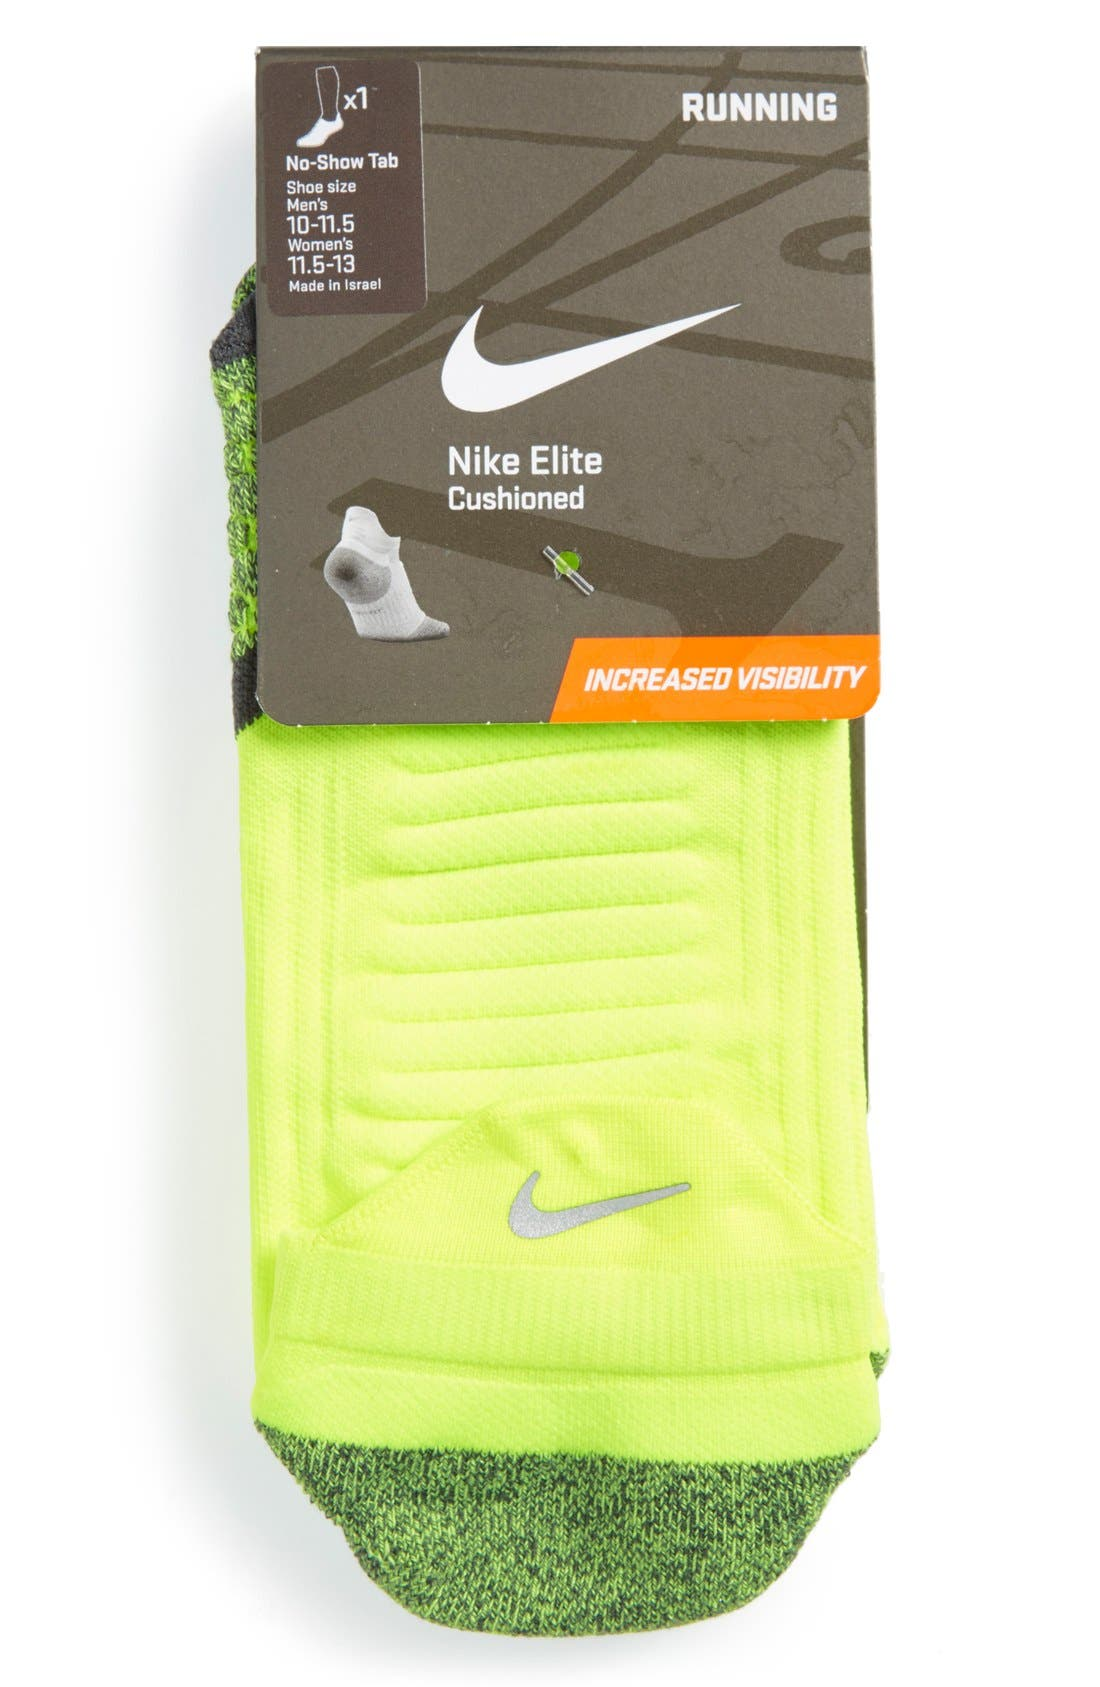 Alternate Image 4  - Nike 'Elite' Cushioned No-Show Tab Running Socks